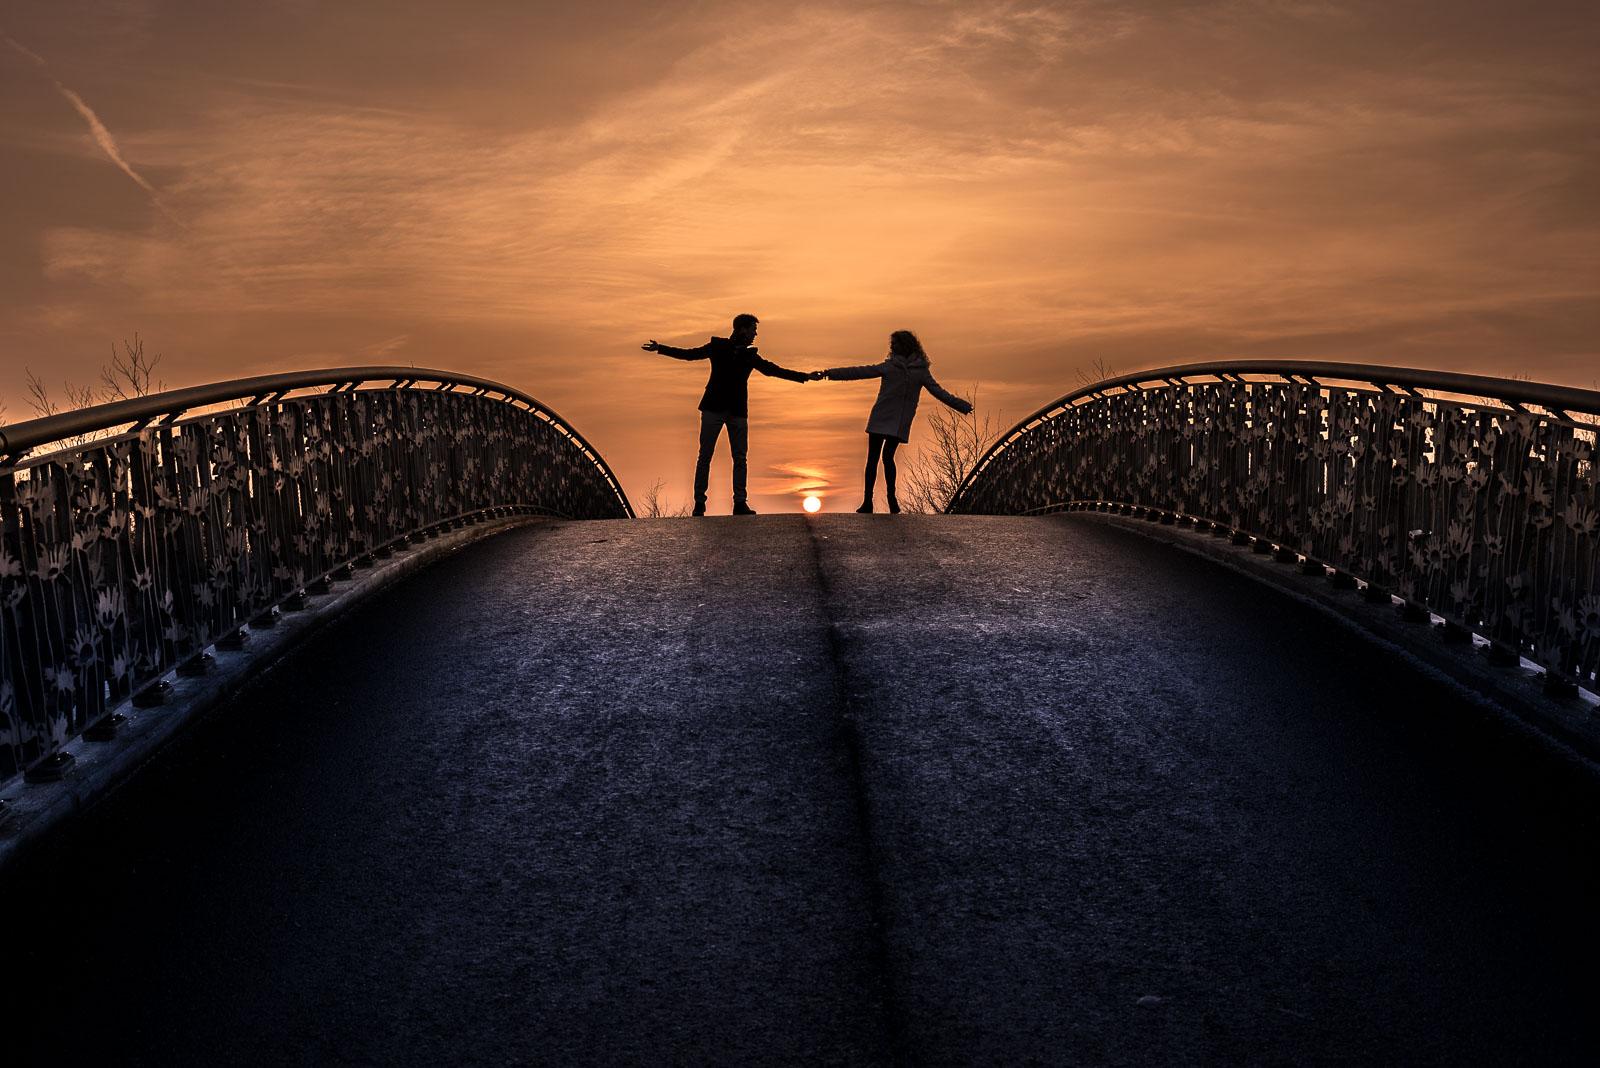 Loveshoot Maximapark Utrecht zonsondergang